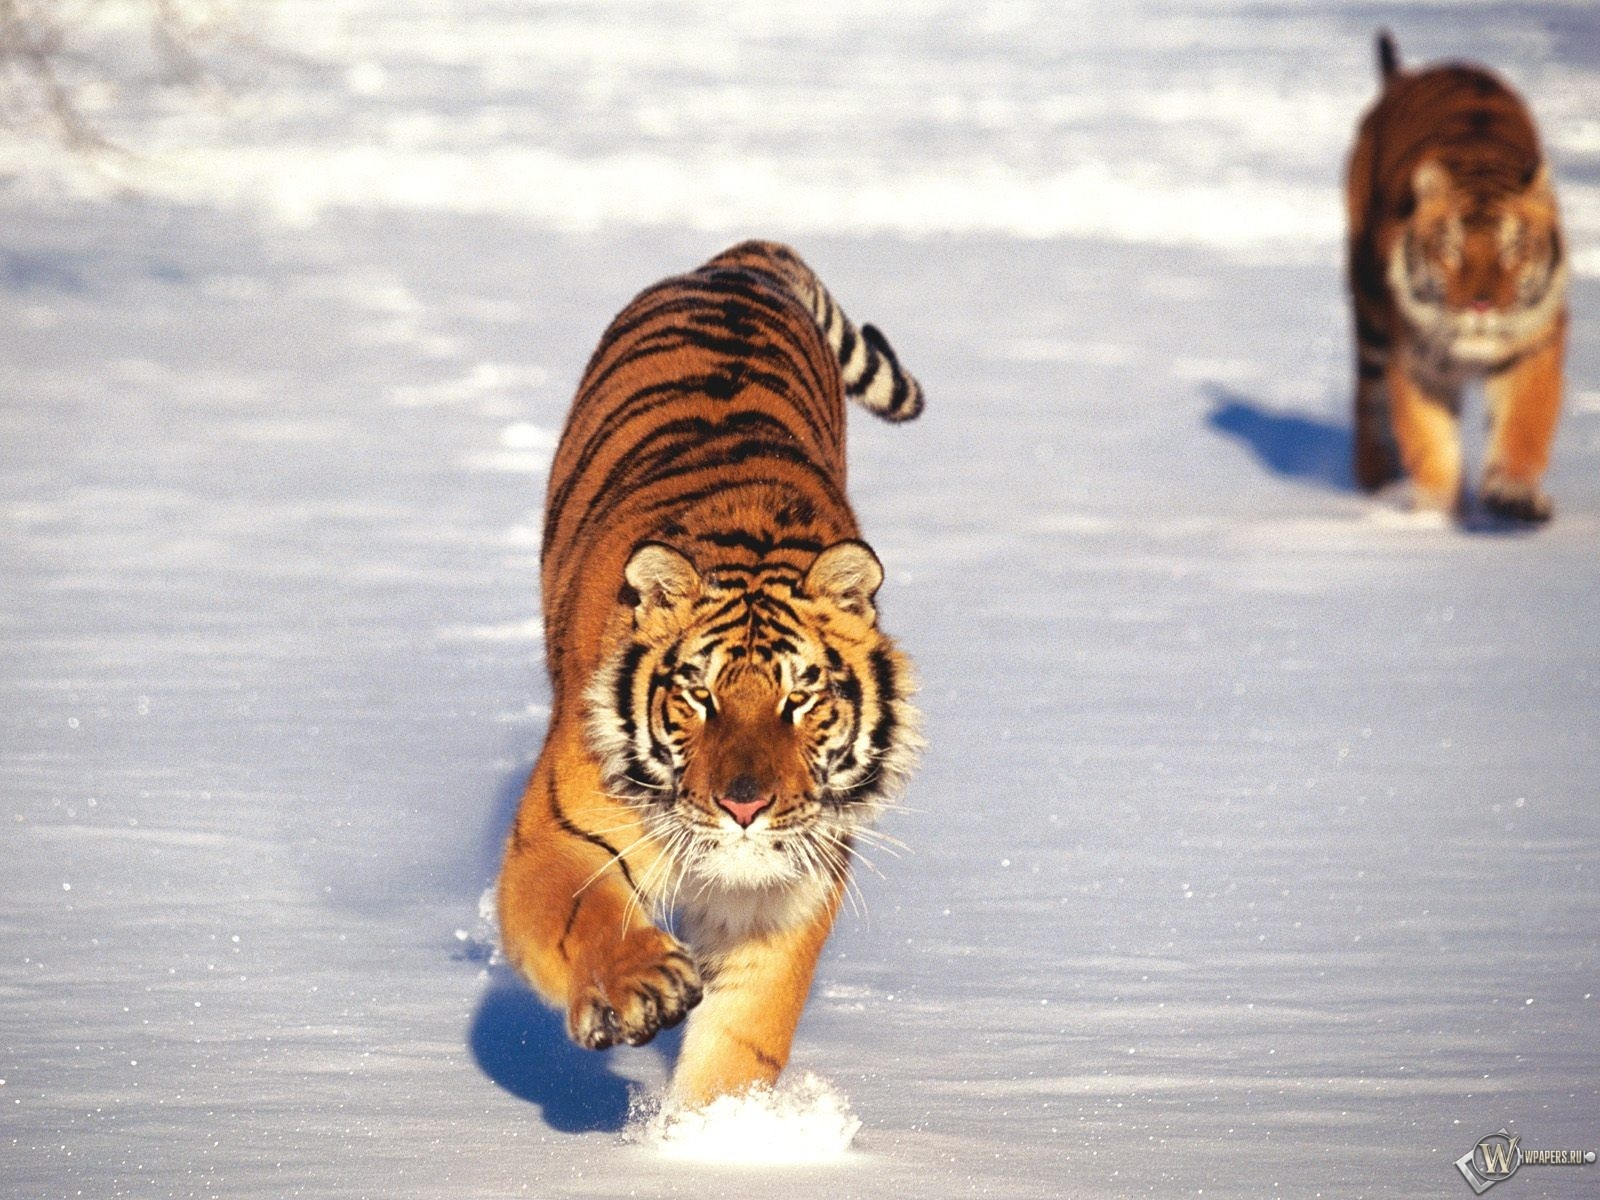 Два тигра бегущие по снегу 1600x1200